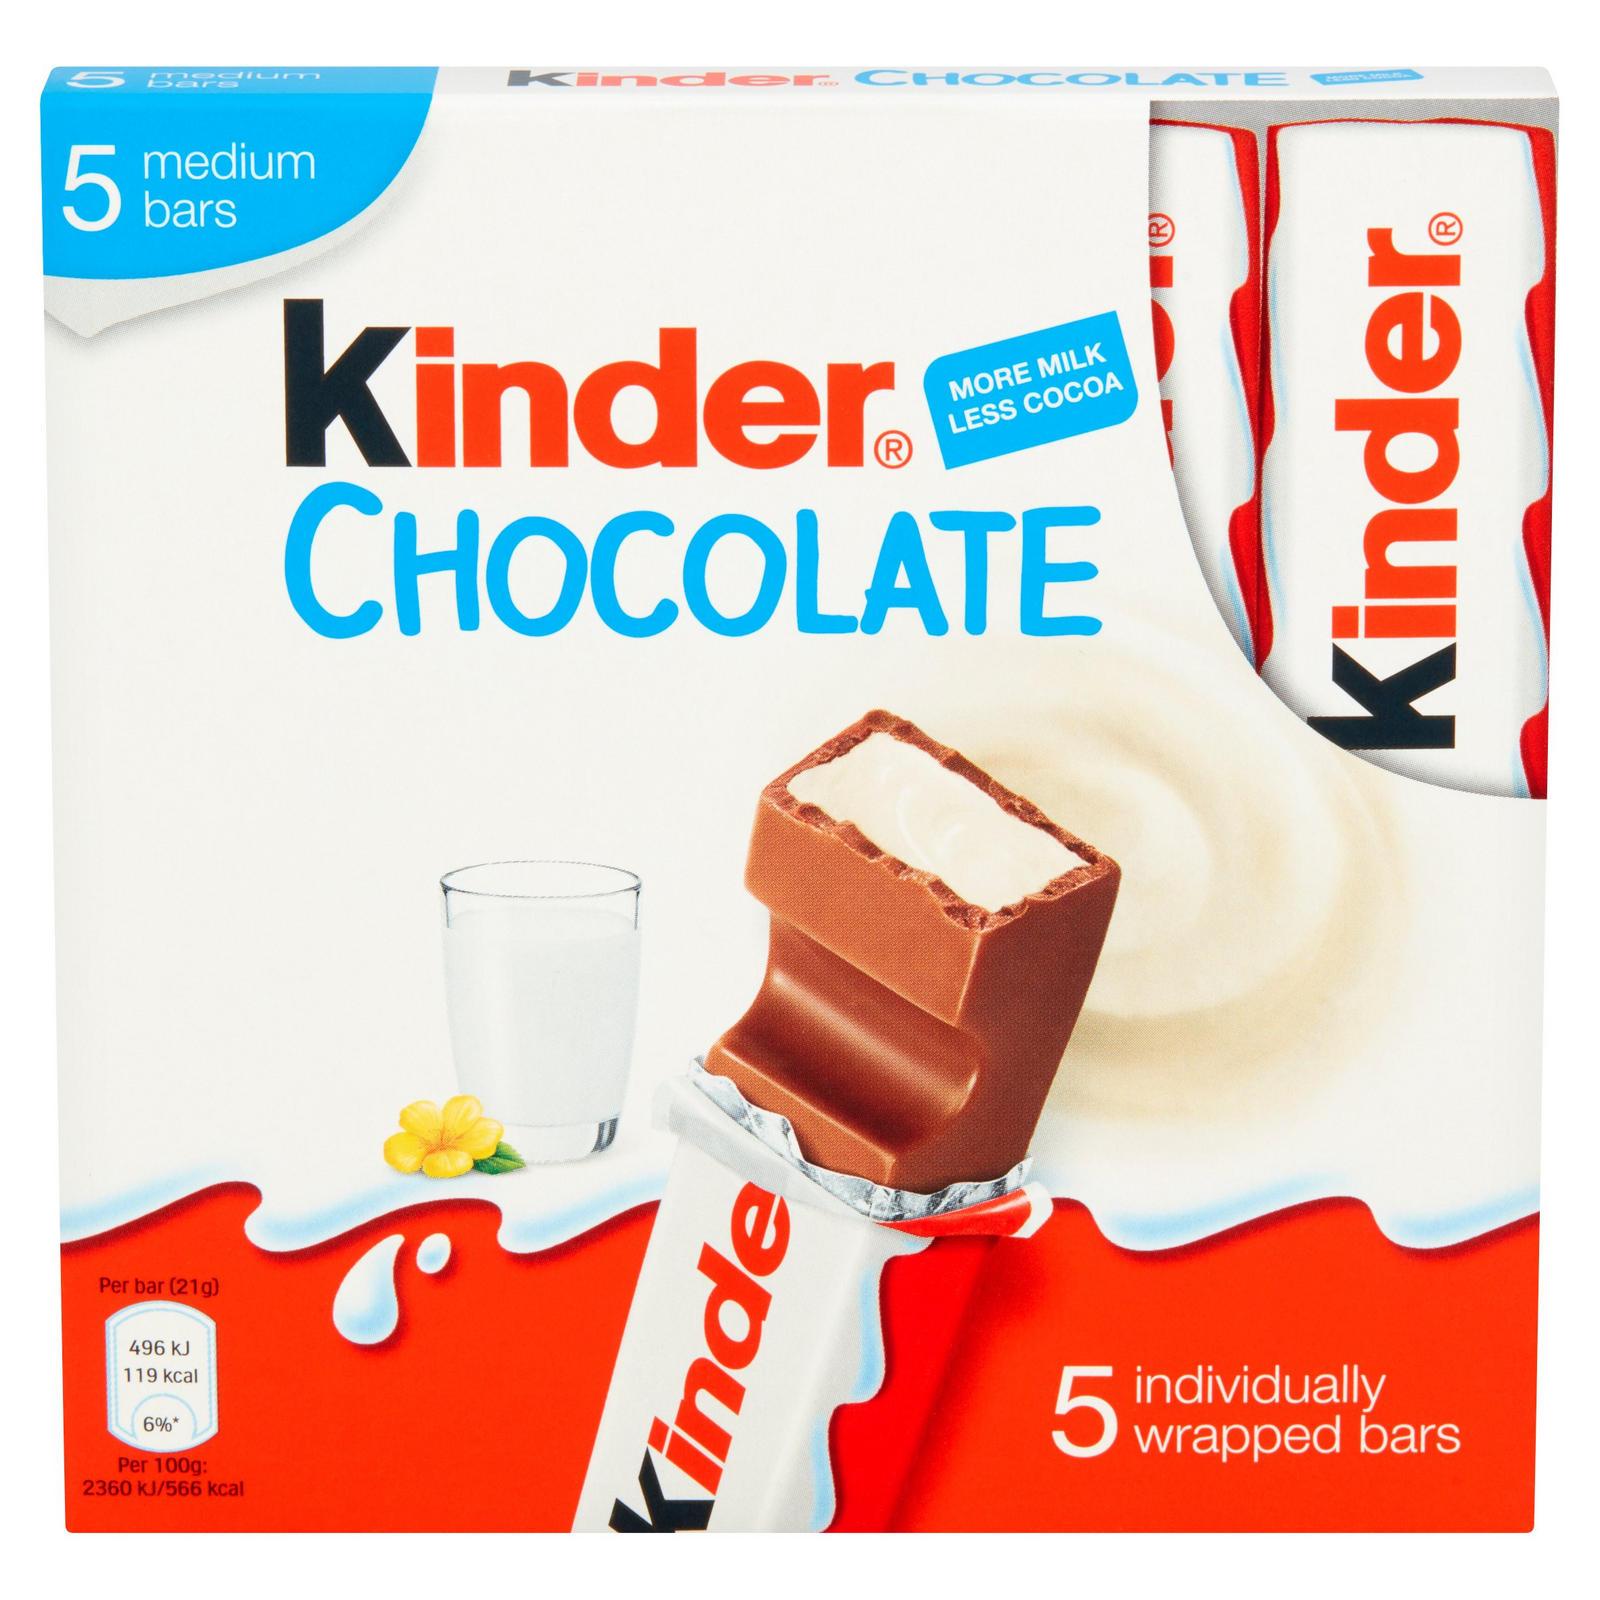 Kinder Medium Chocolate Multipack Bars 5 X 21g 105g